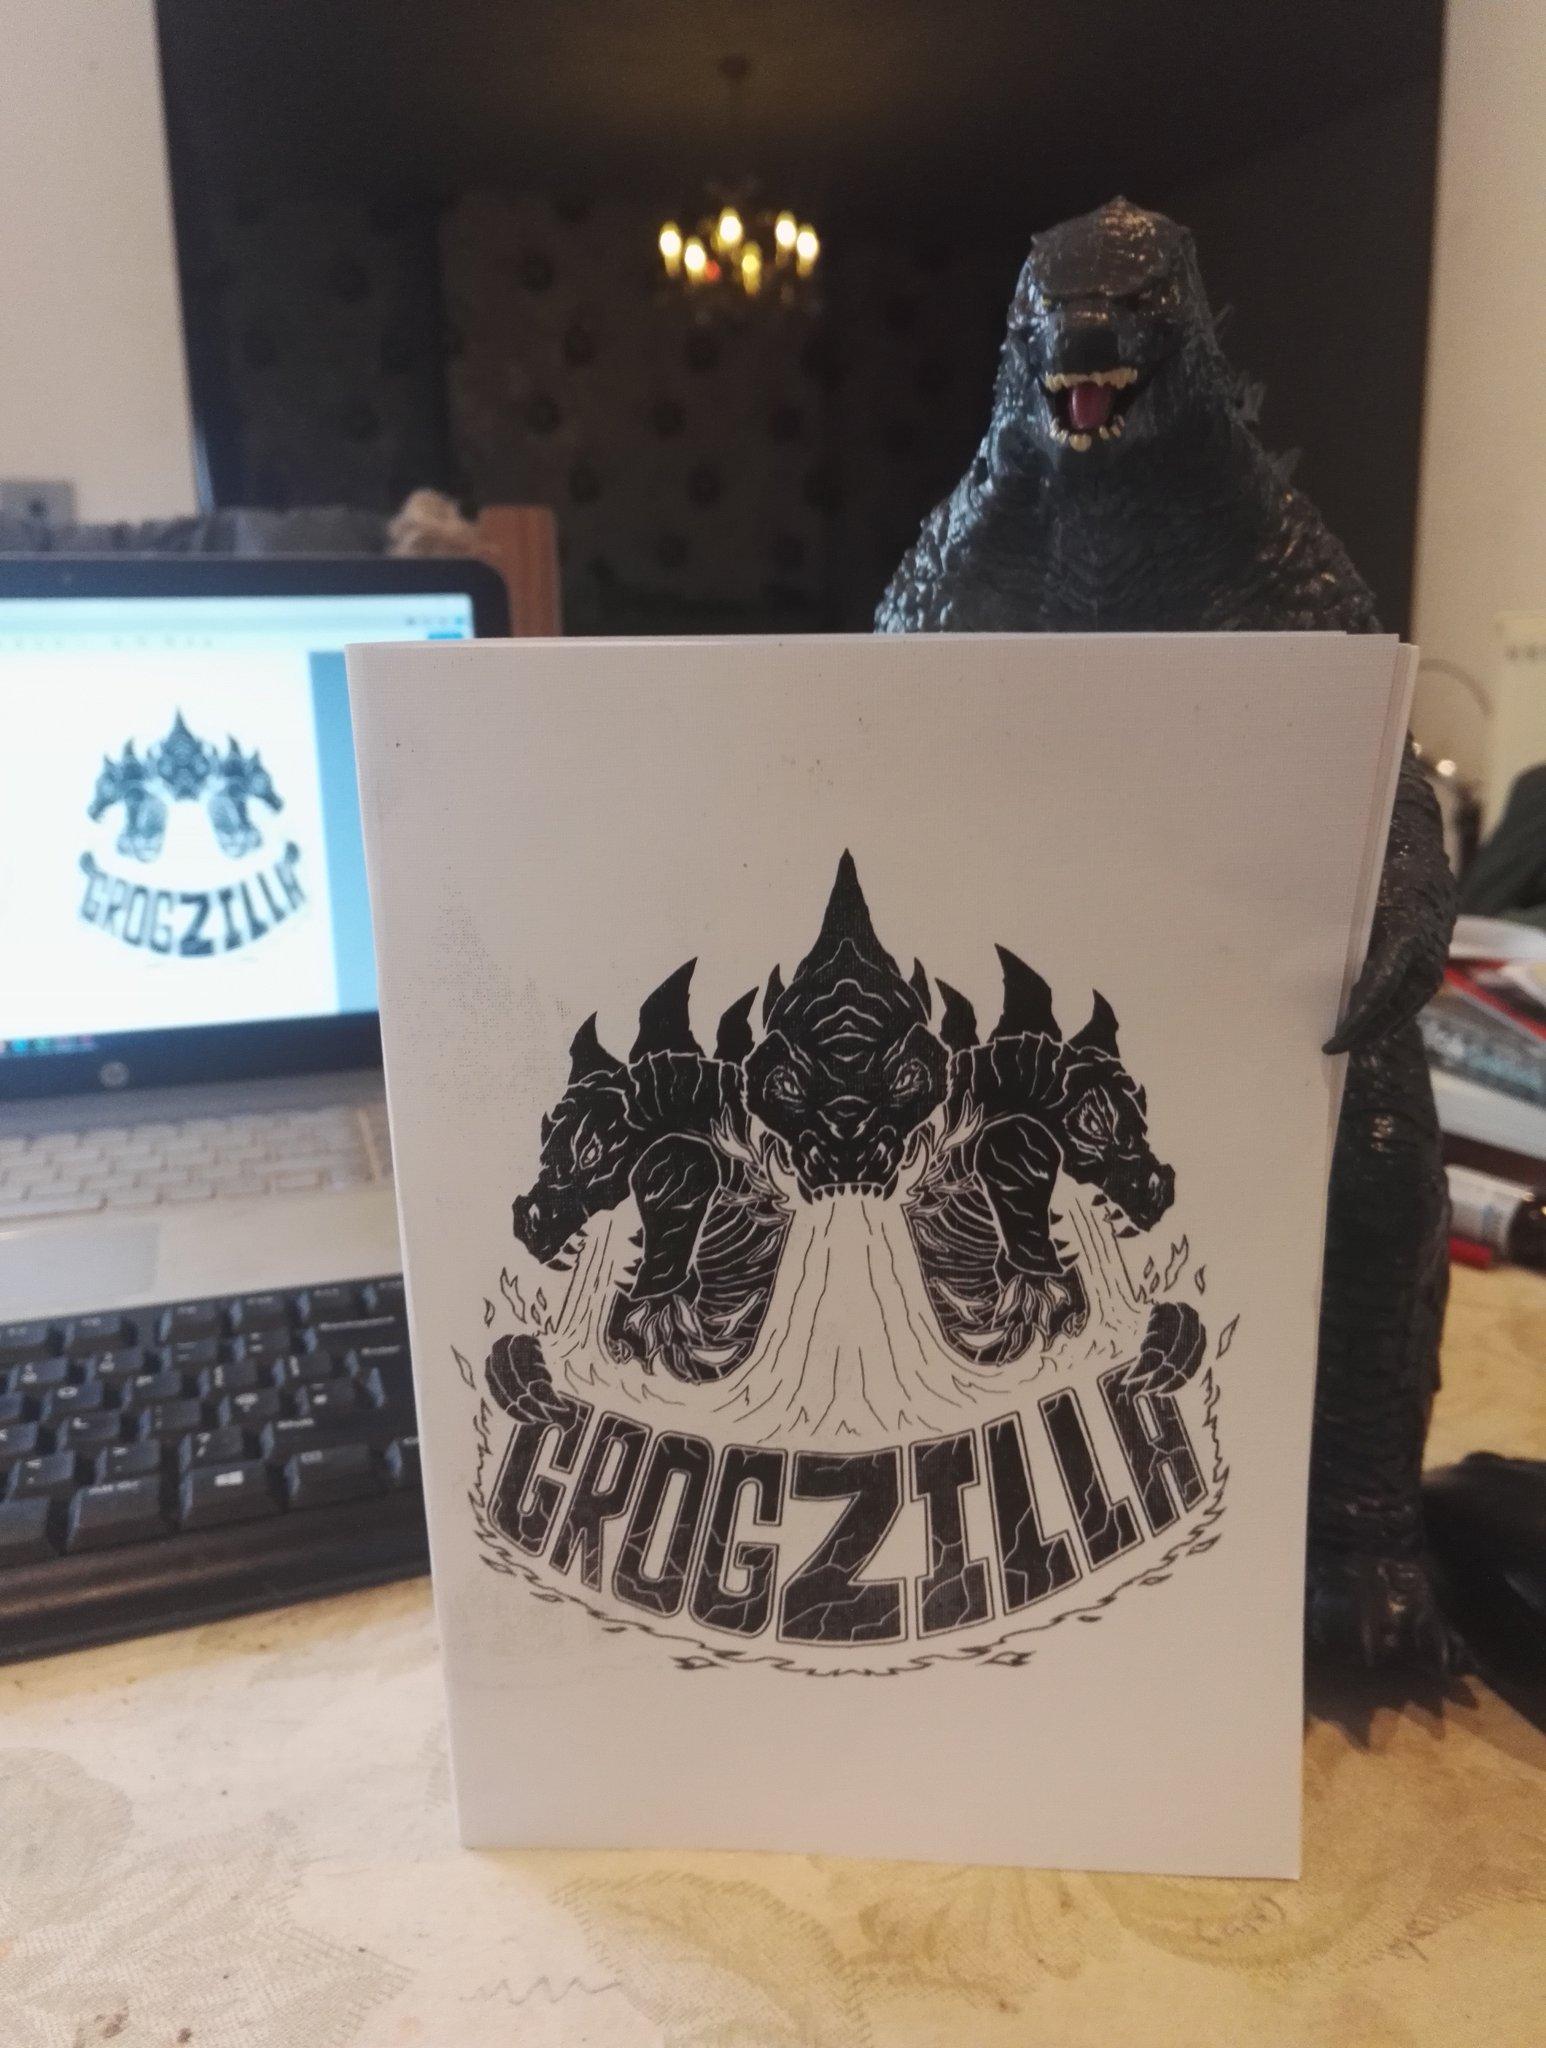 Grogzilla